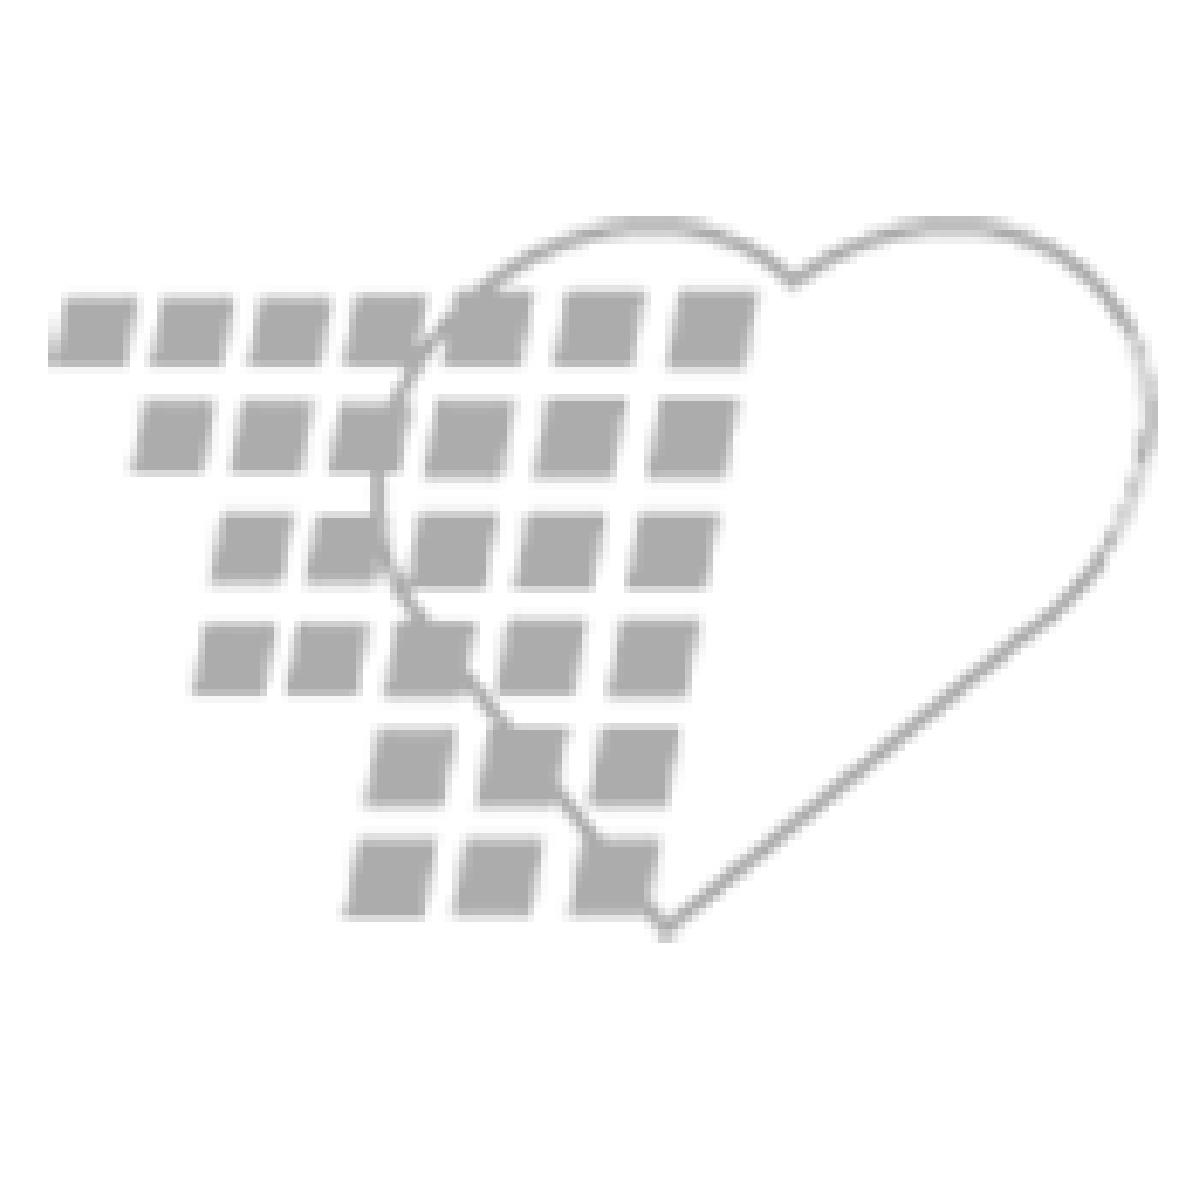 11-81-1008 ReaLifeSim IV  Adult IV Trainer with RLSimApp